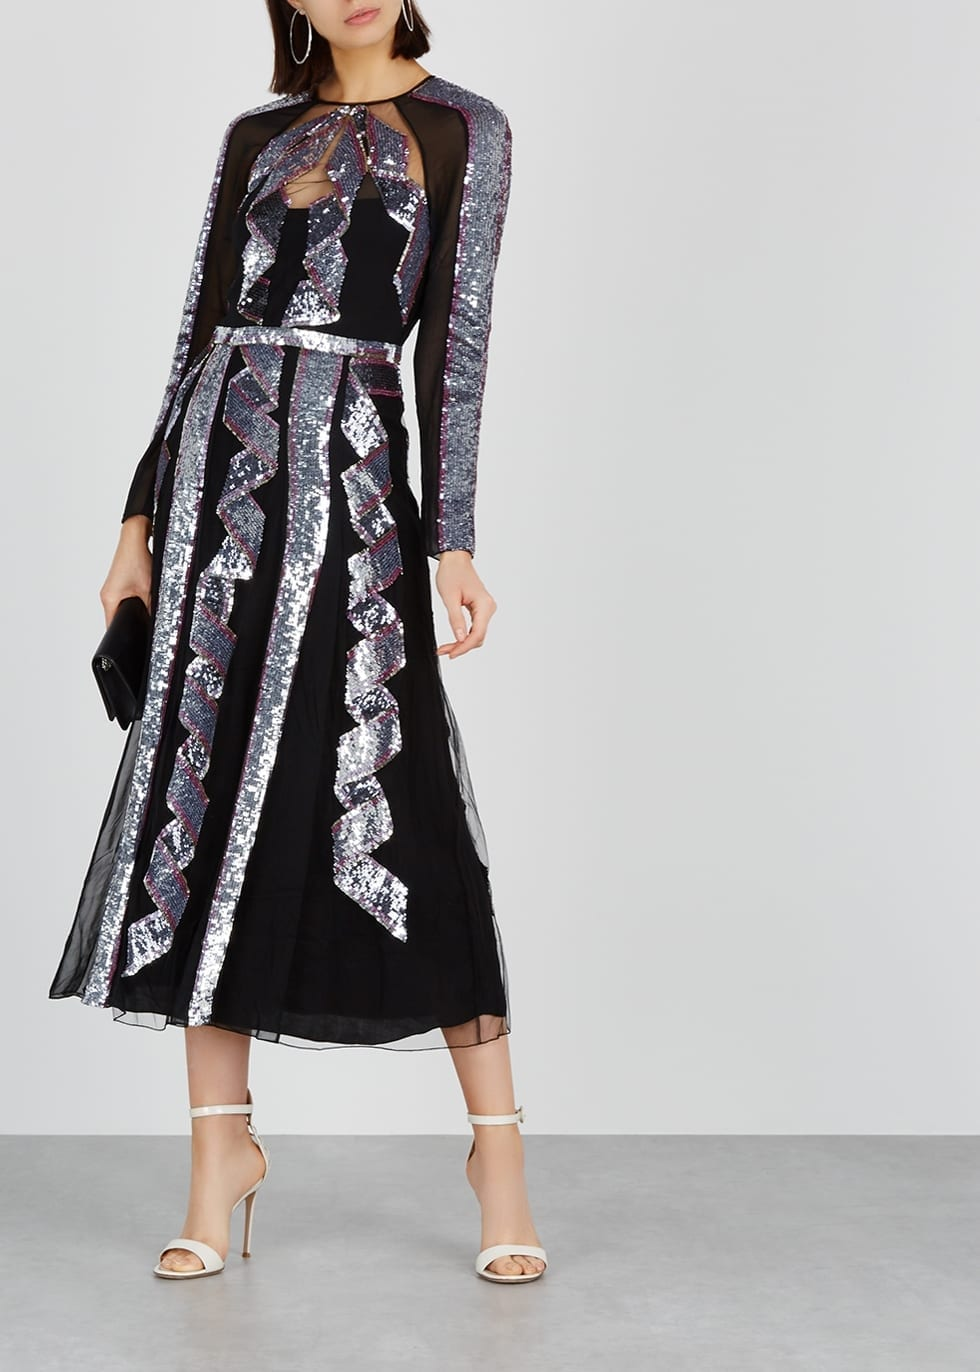 TEMPERLEY Sequin-Embellished Tulle Midi Black Dress